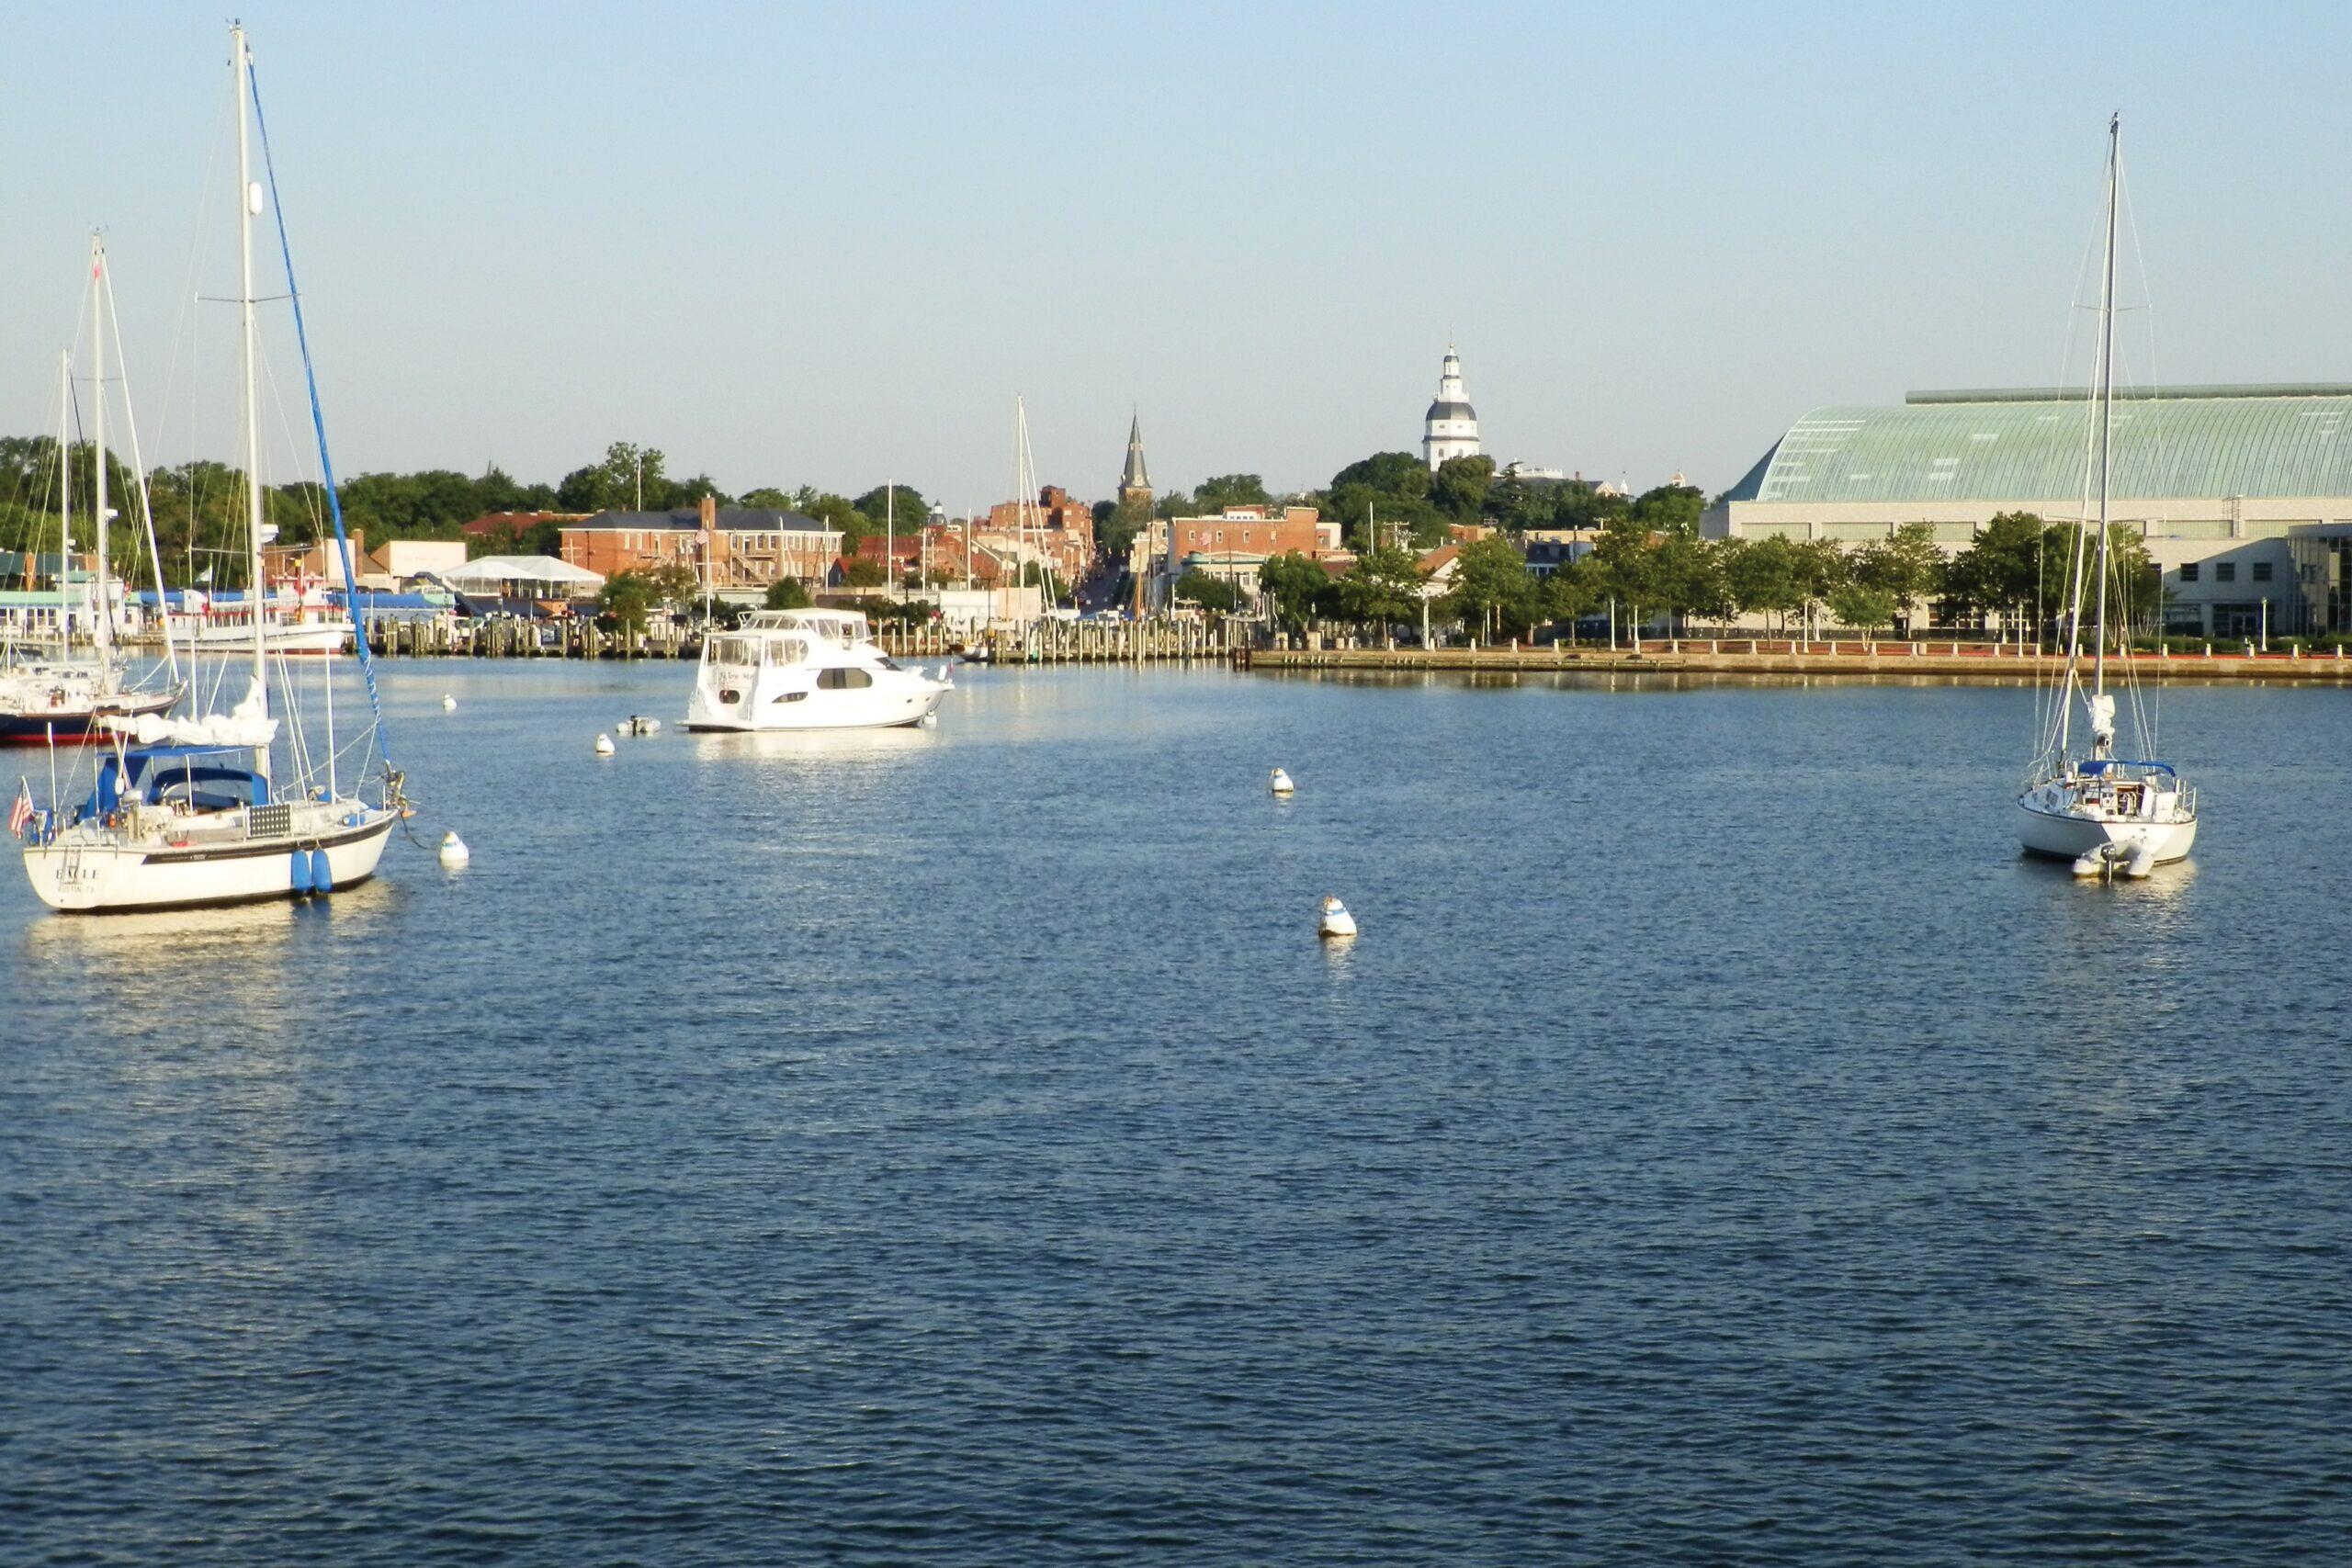 Chesapeake Bay Heritage Cruise